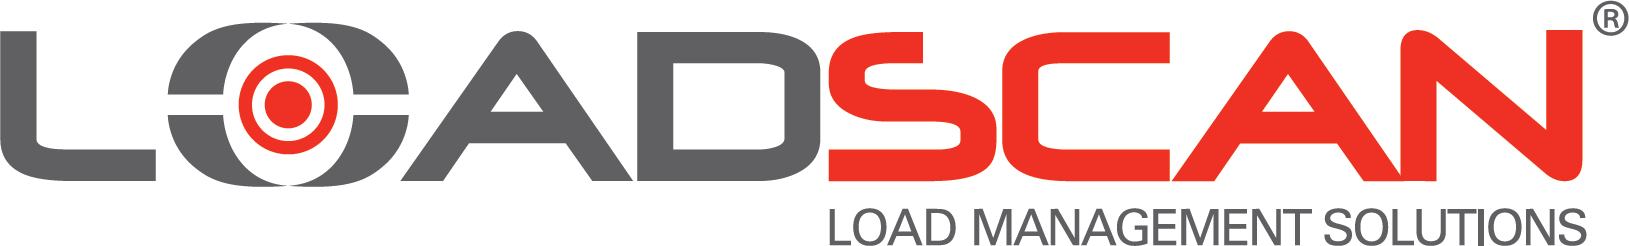 LoadScan Logo